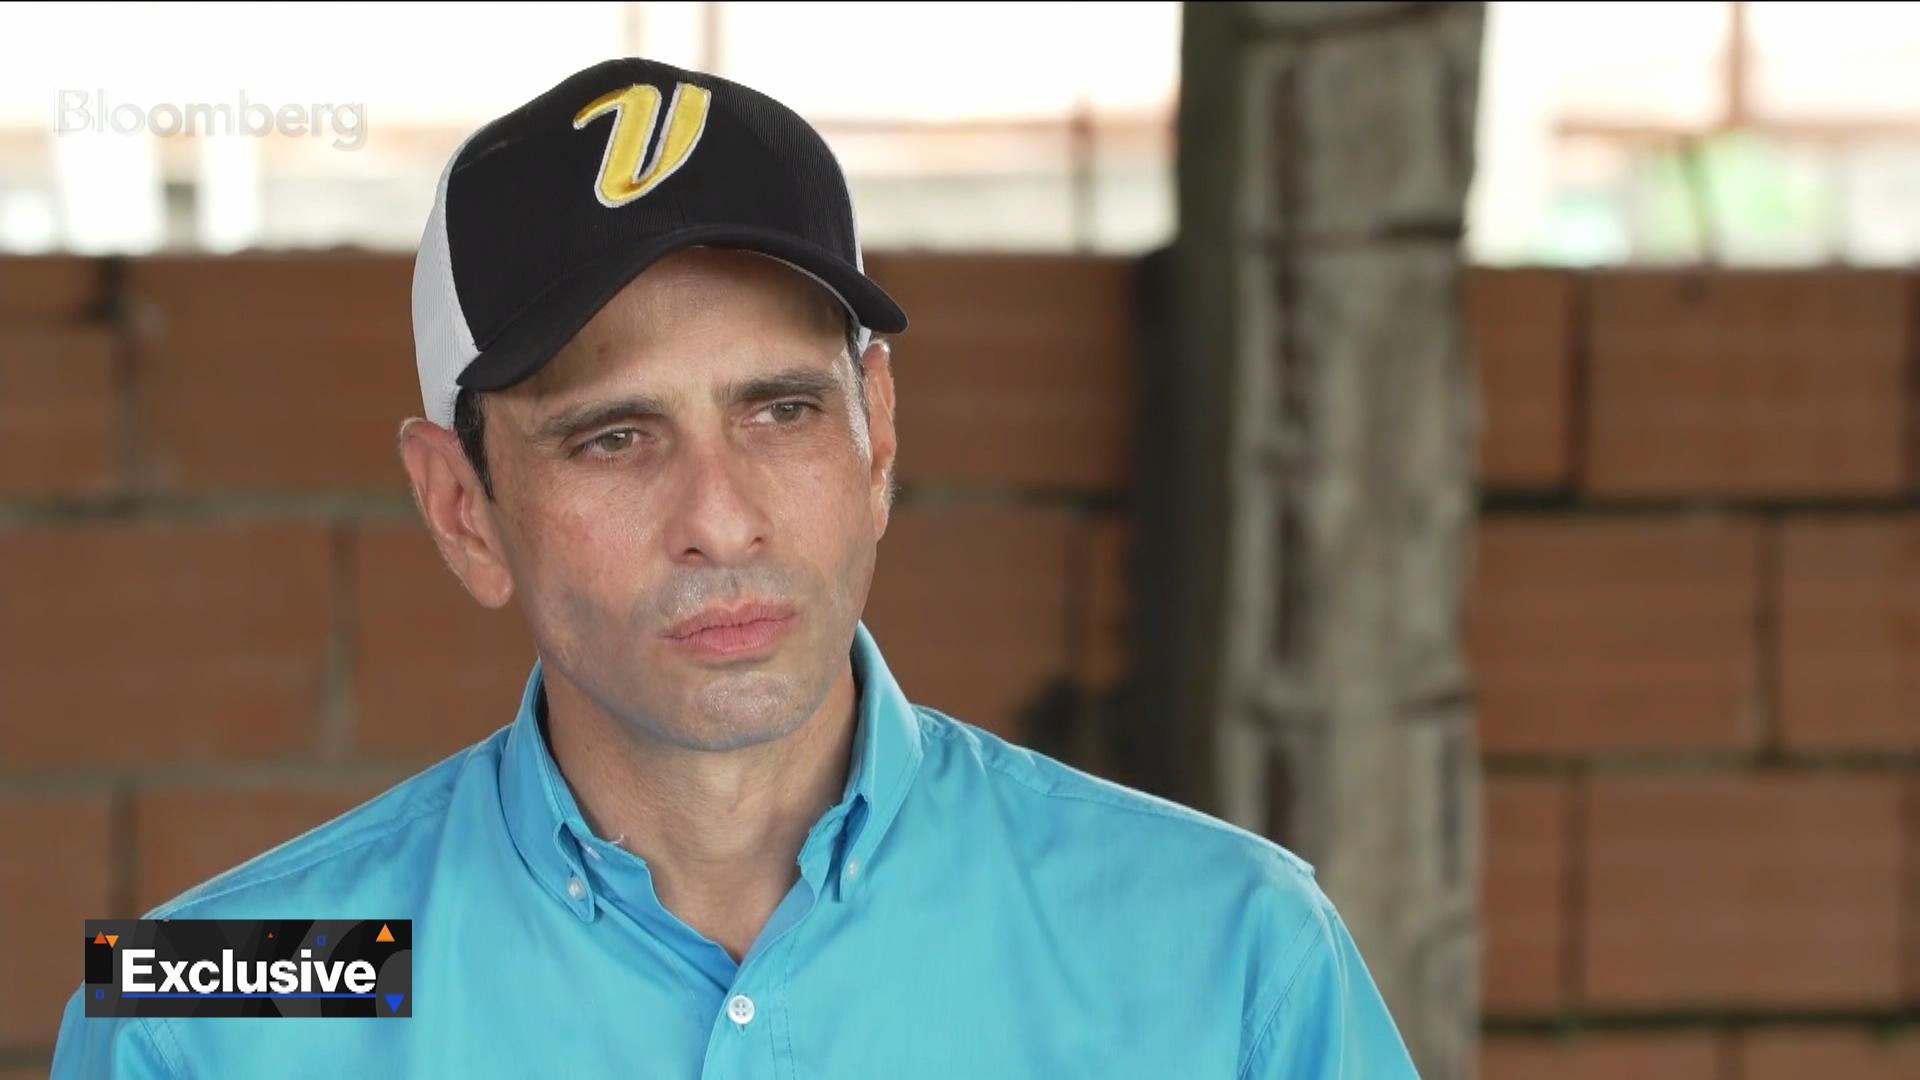 Venezuela Opposition Leader Capriles Says Pressure on Maduro